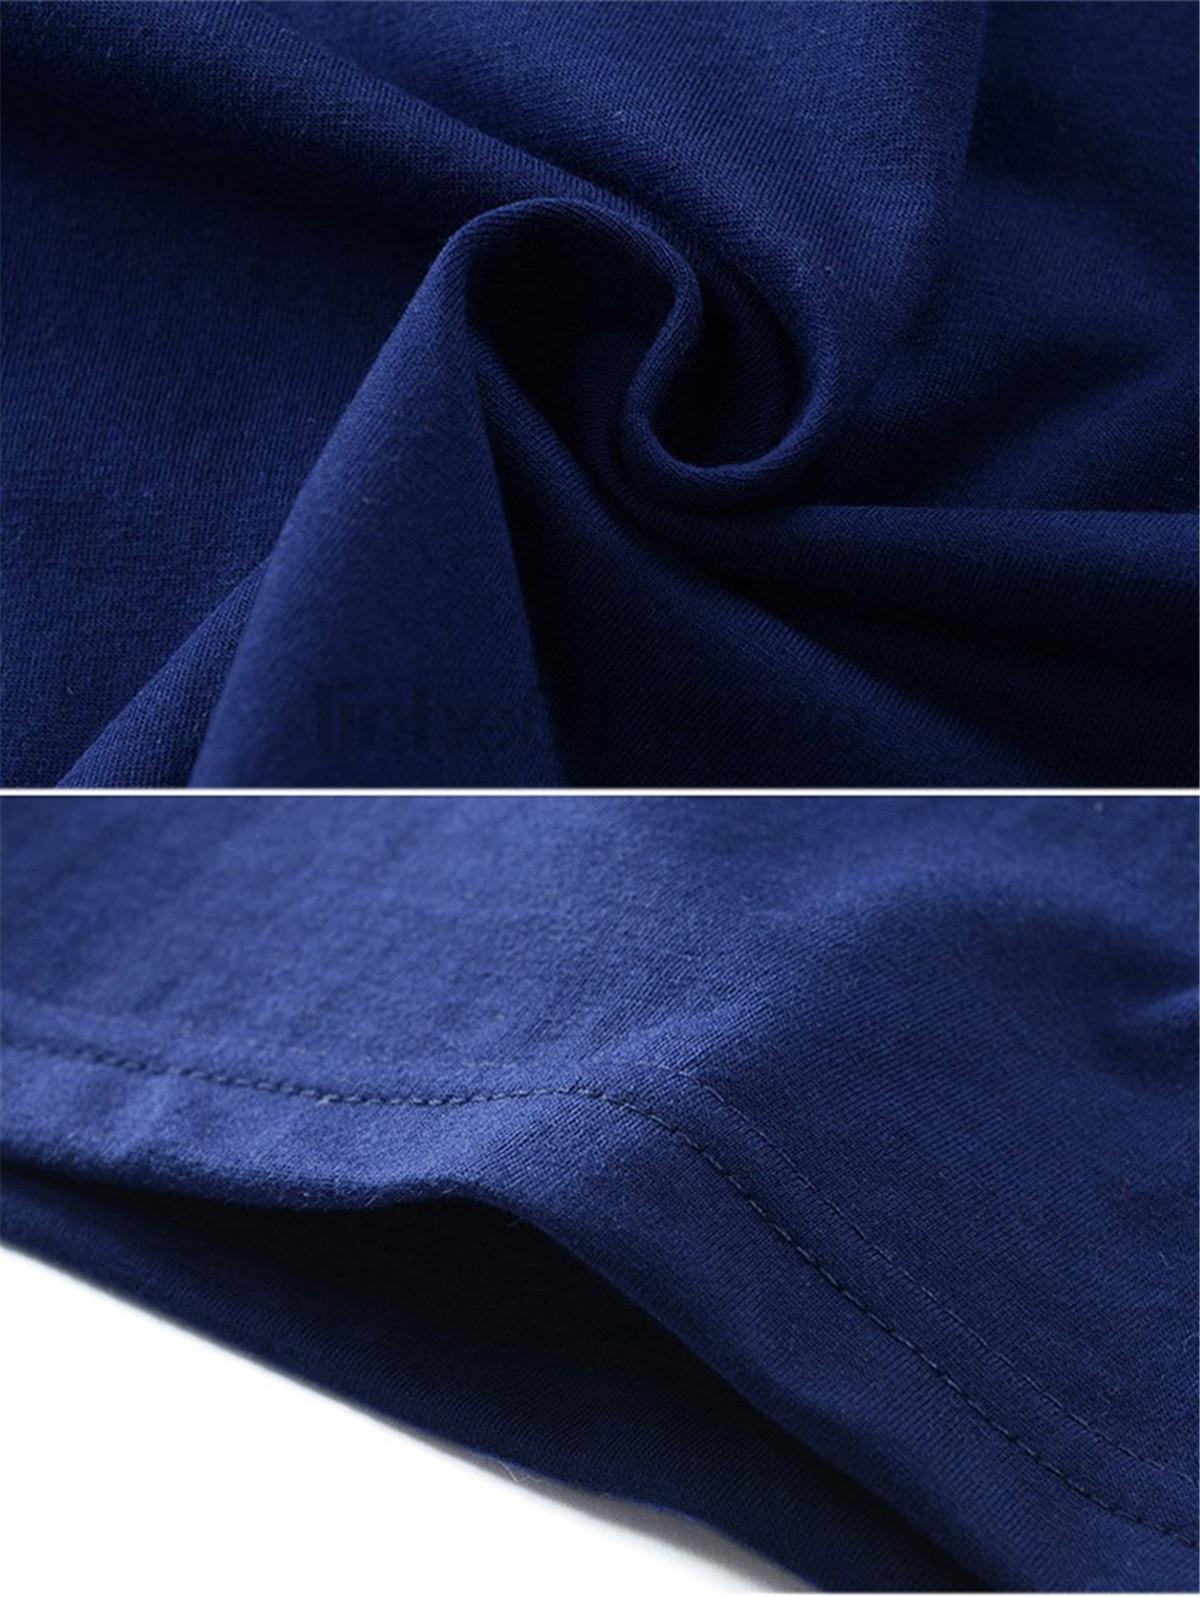 00c4cb06 Aliexpress.com : Buy GILDAN Funny Senior 2017 Shirt College High School  Graduation Gift dress T shirt from Reliable T-Shirts suppliers on  Shop3893005 Store